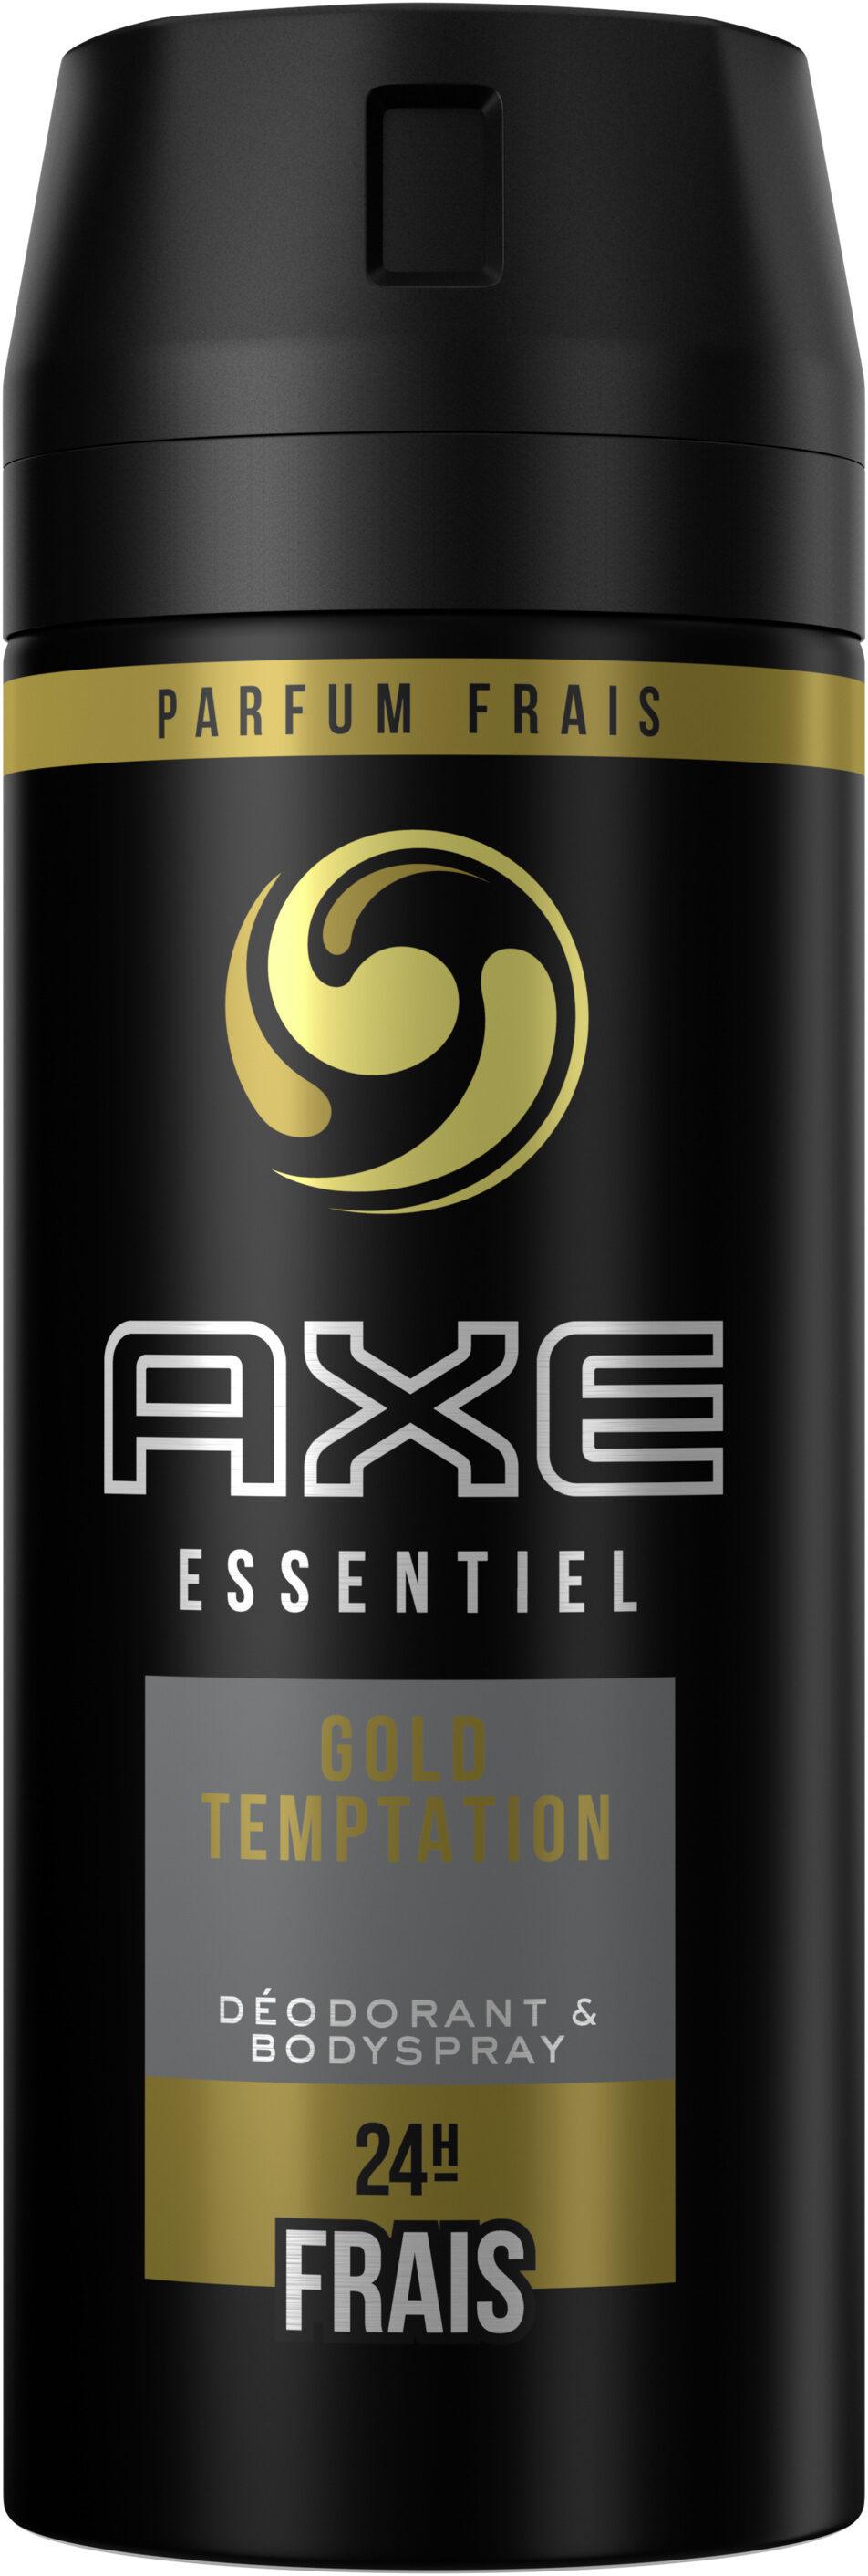 AXE Déodorant Gold Temptation - Product - fr